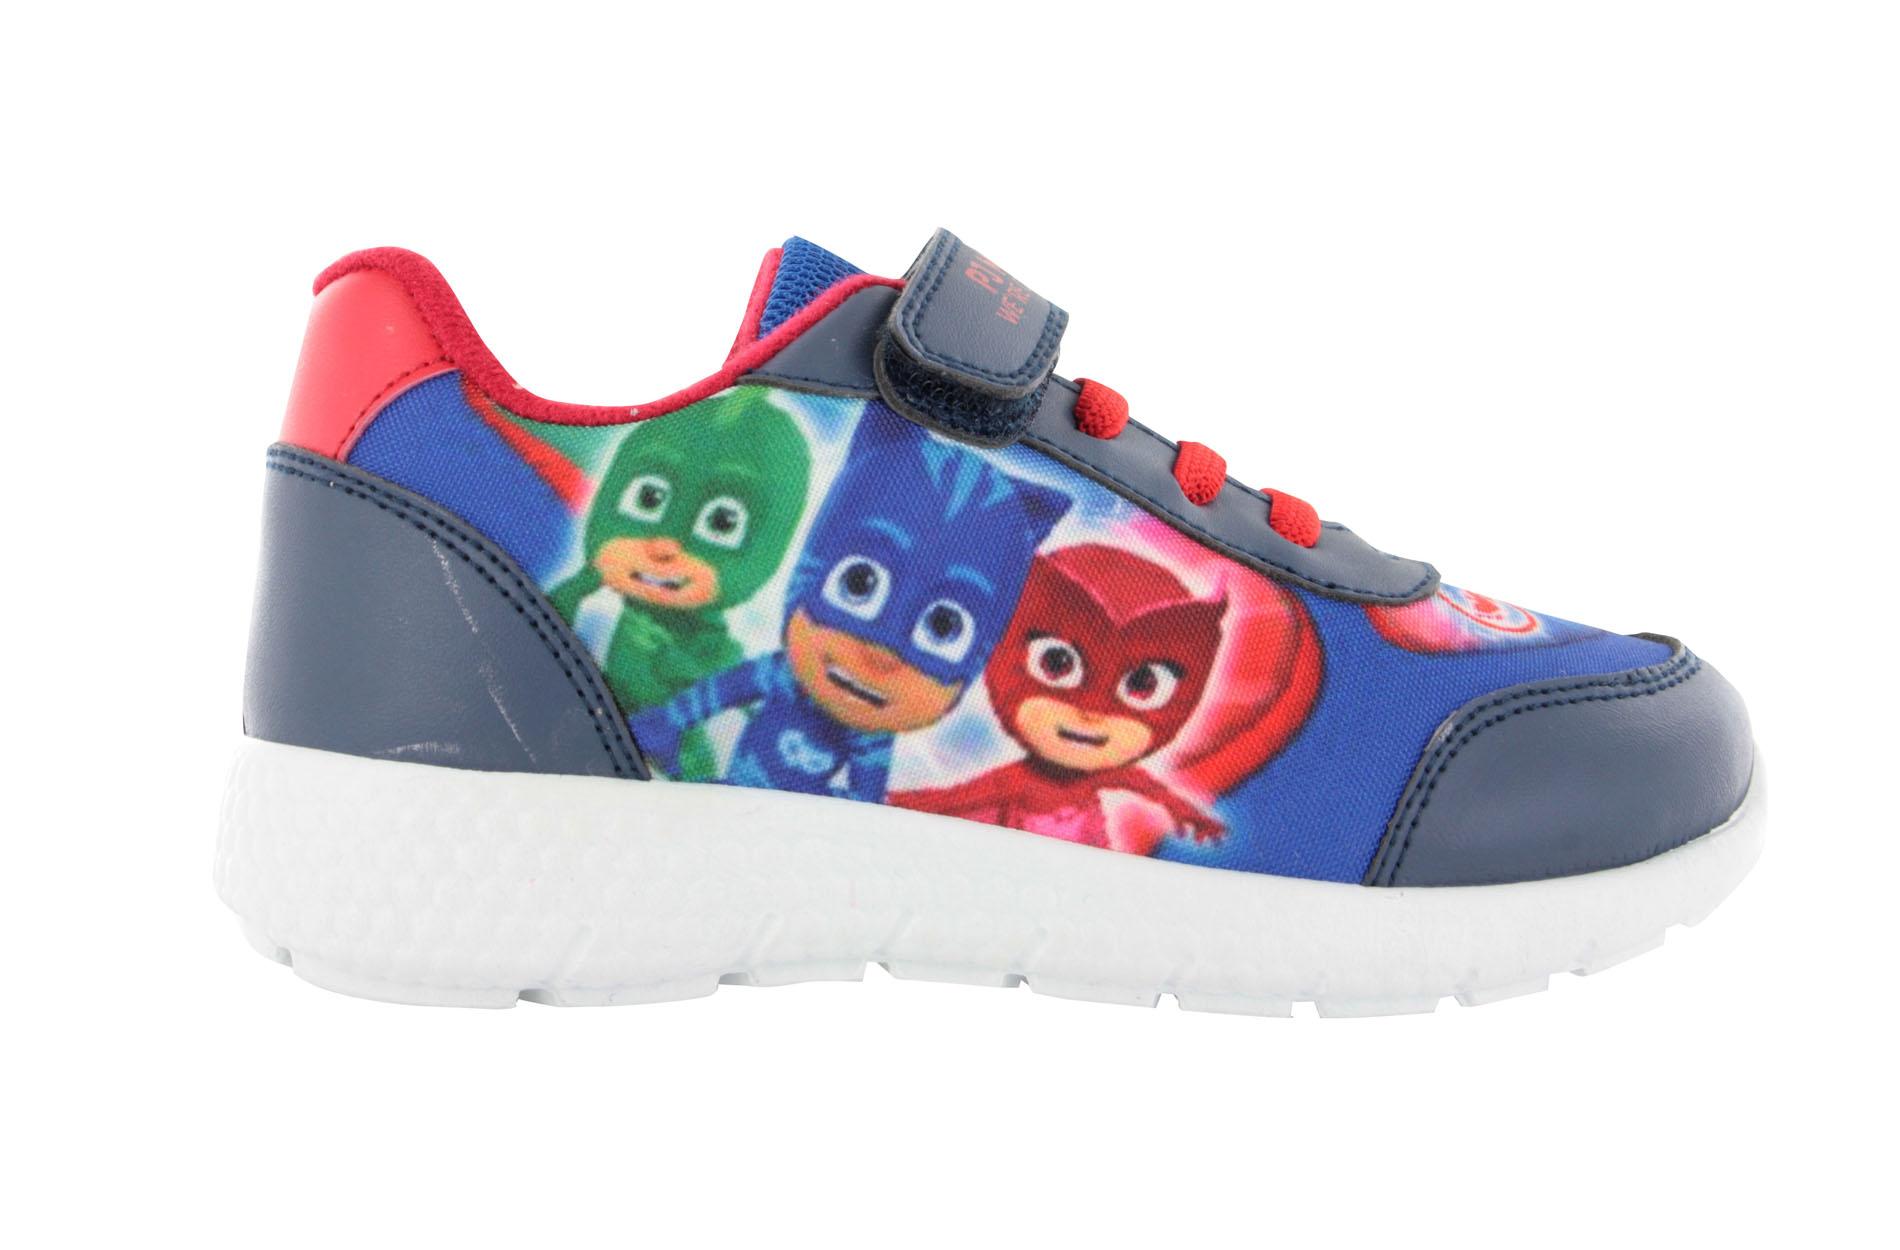 Paddington Bear Peru wellington boots size 5-12 boys childrens shoes wellies